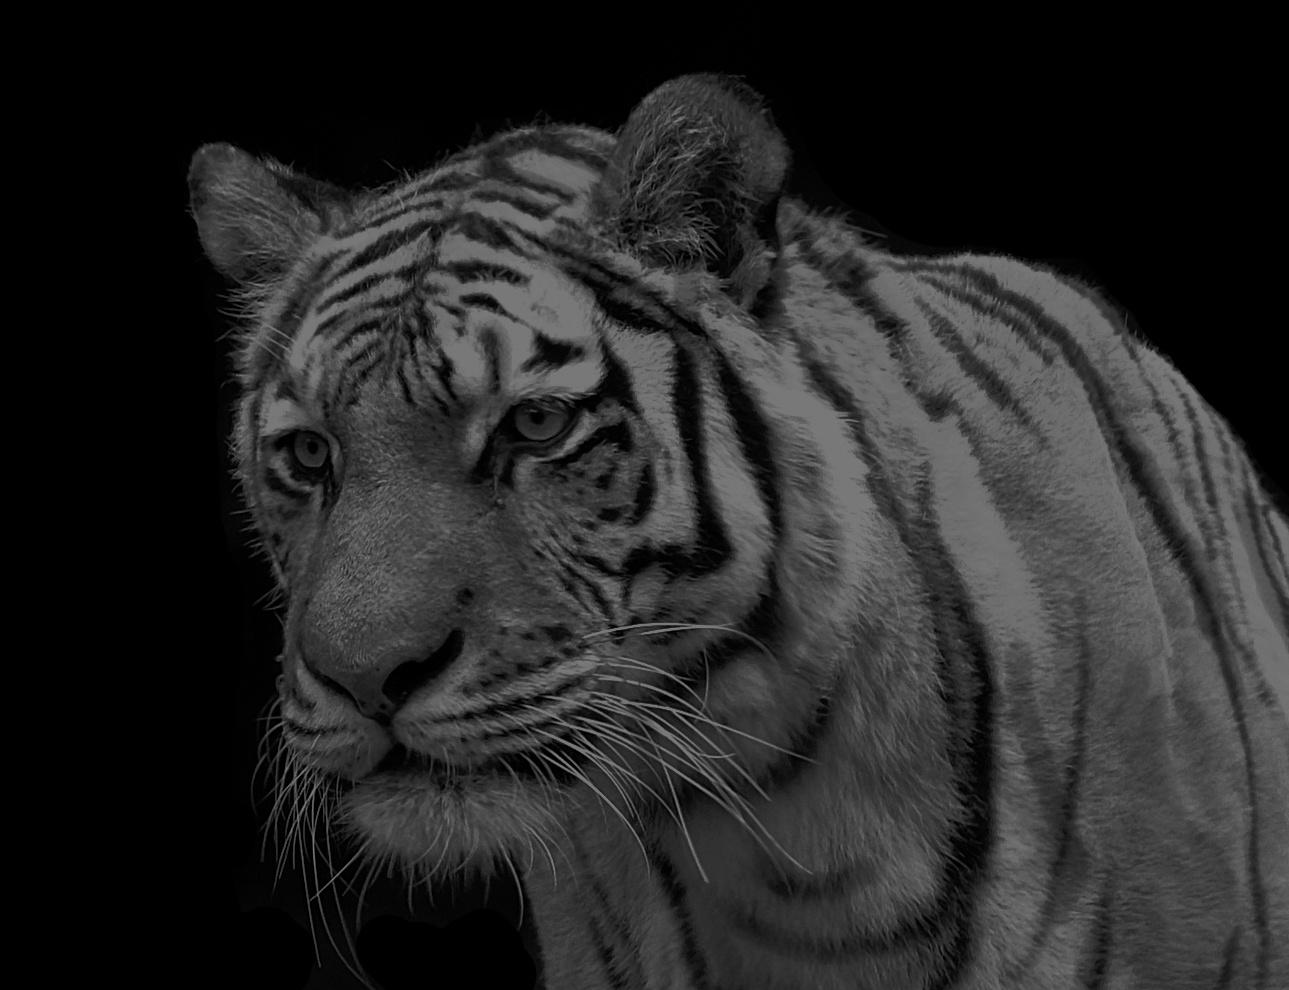 Milwaukee Tiger by Wovoka